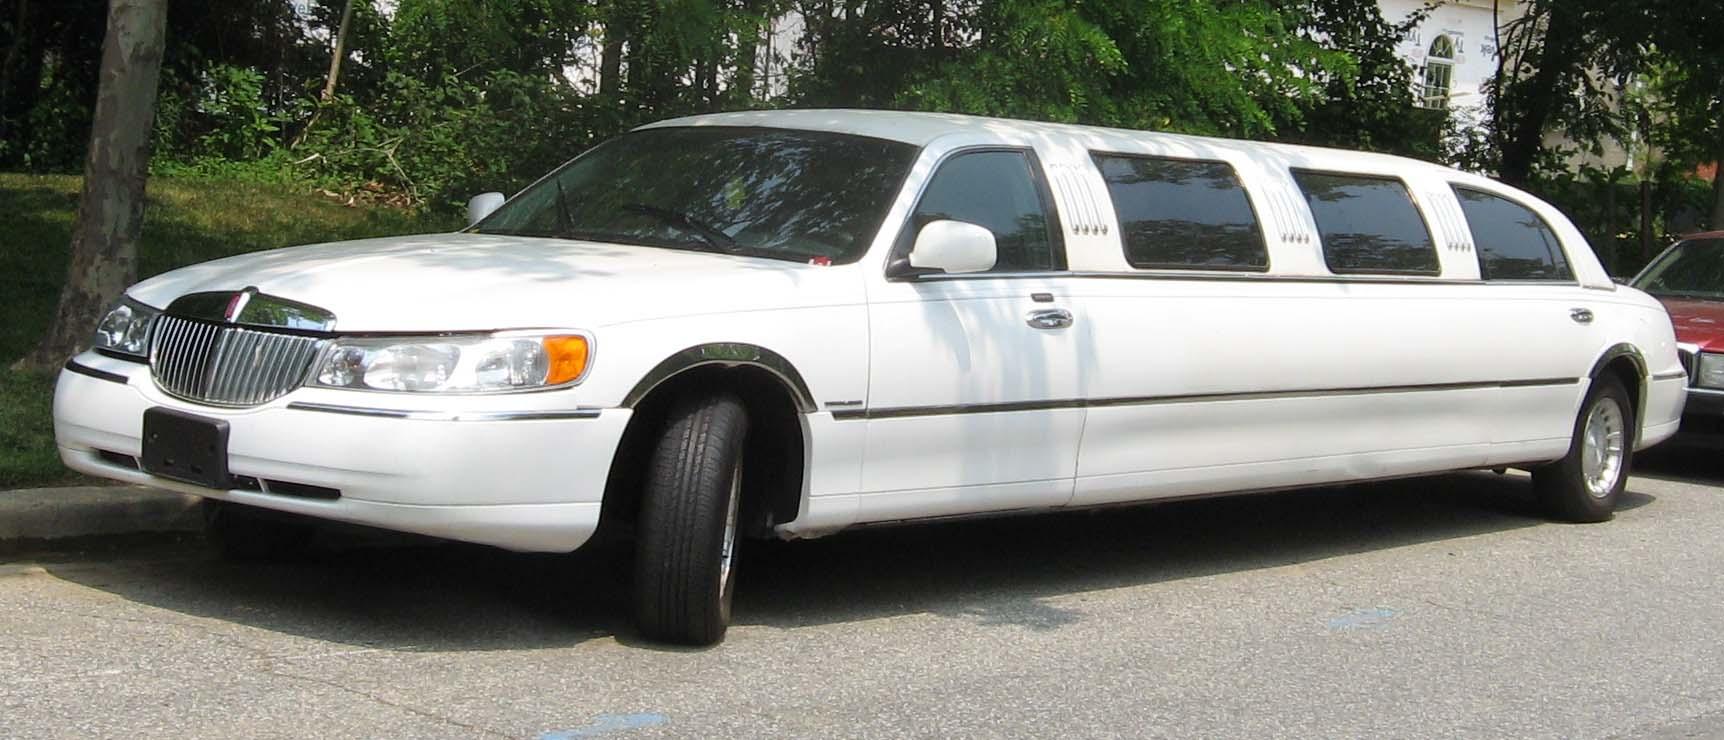 free limousine picture lincoln town car limousine